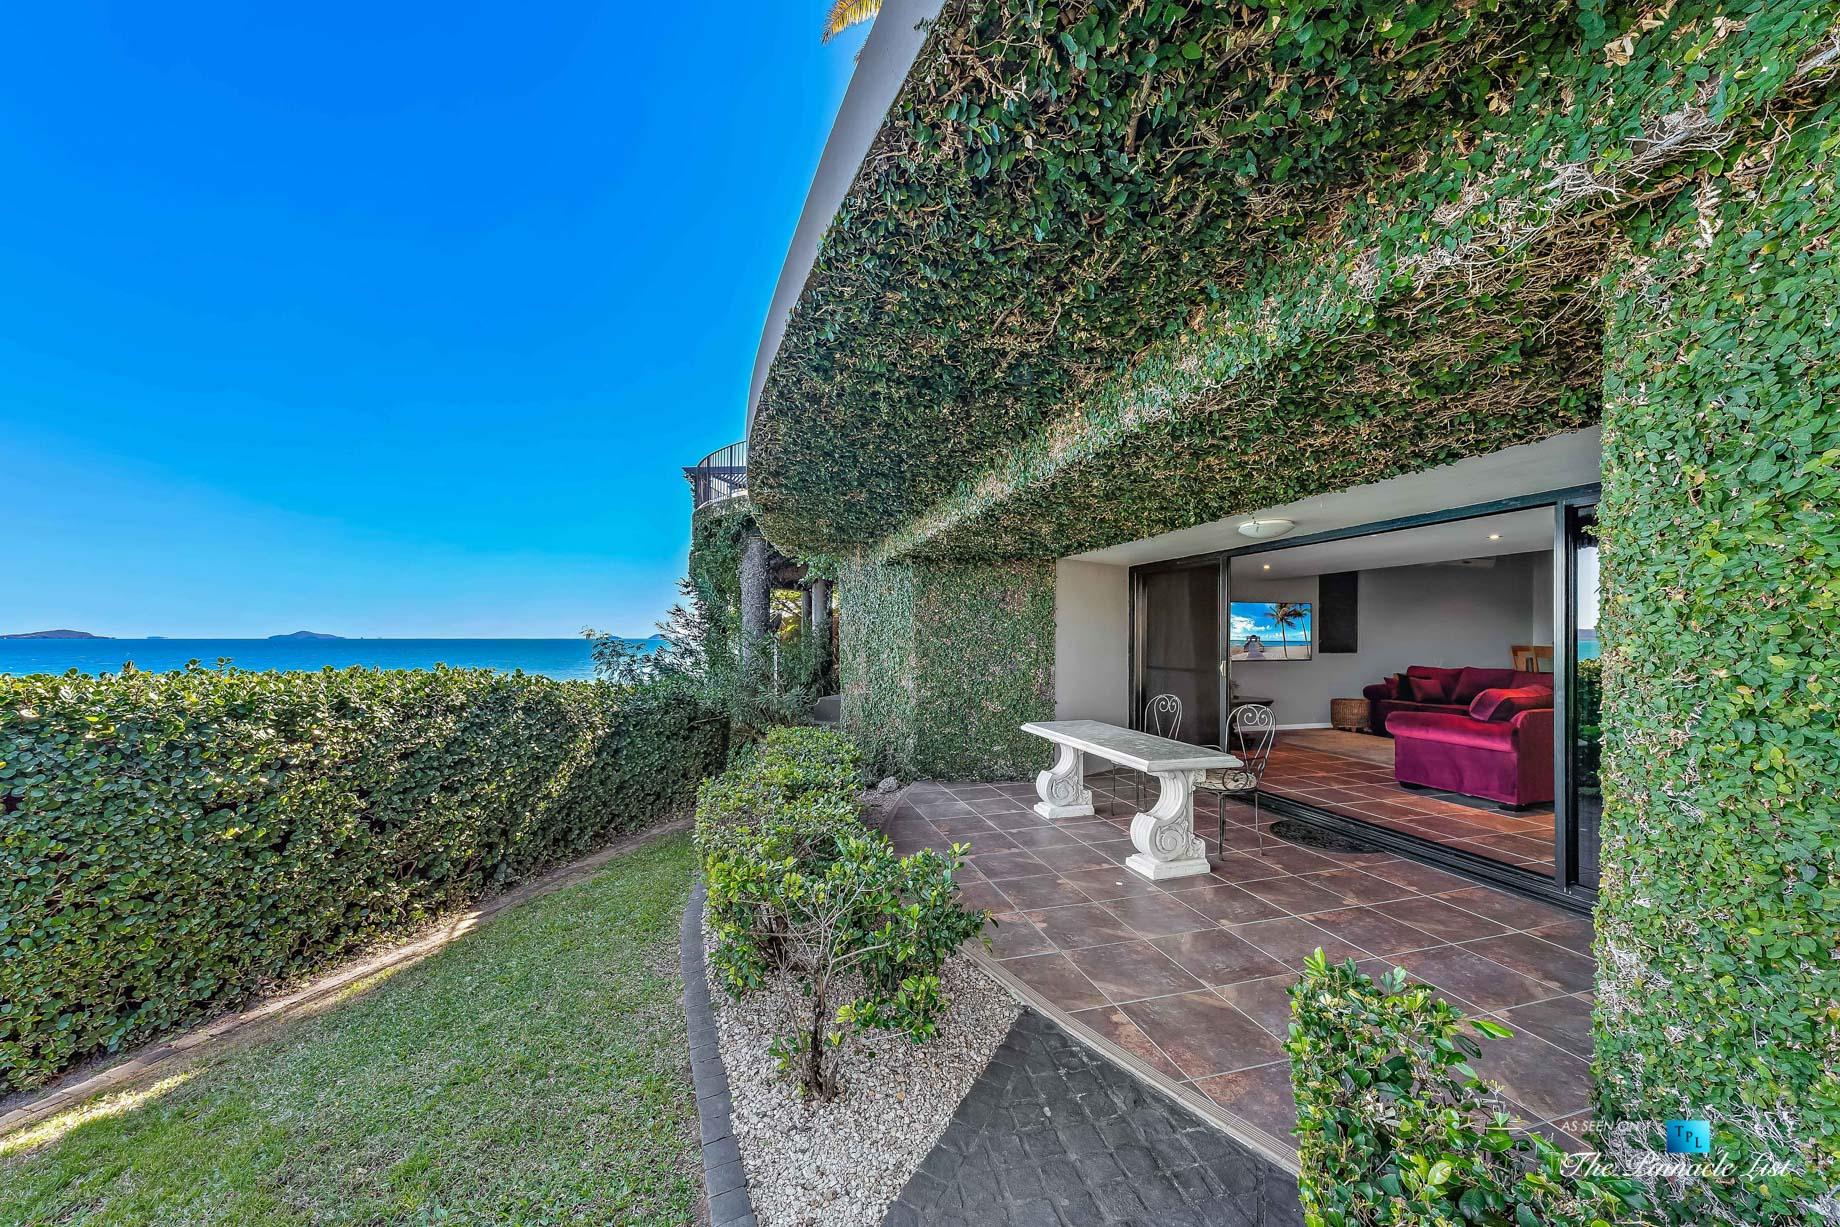 Mandalay House - 5/383 Mandalay Road, Airlie Beach, Queensland, Australia